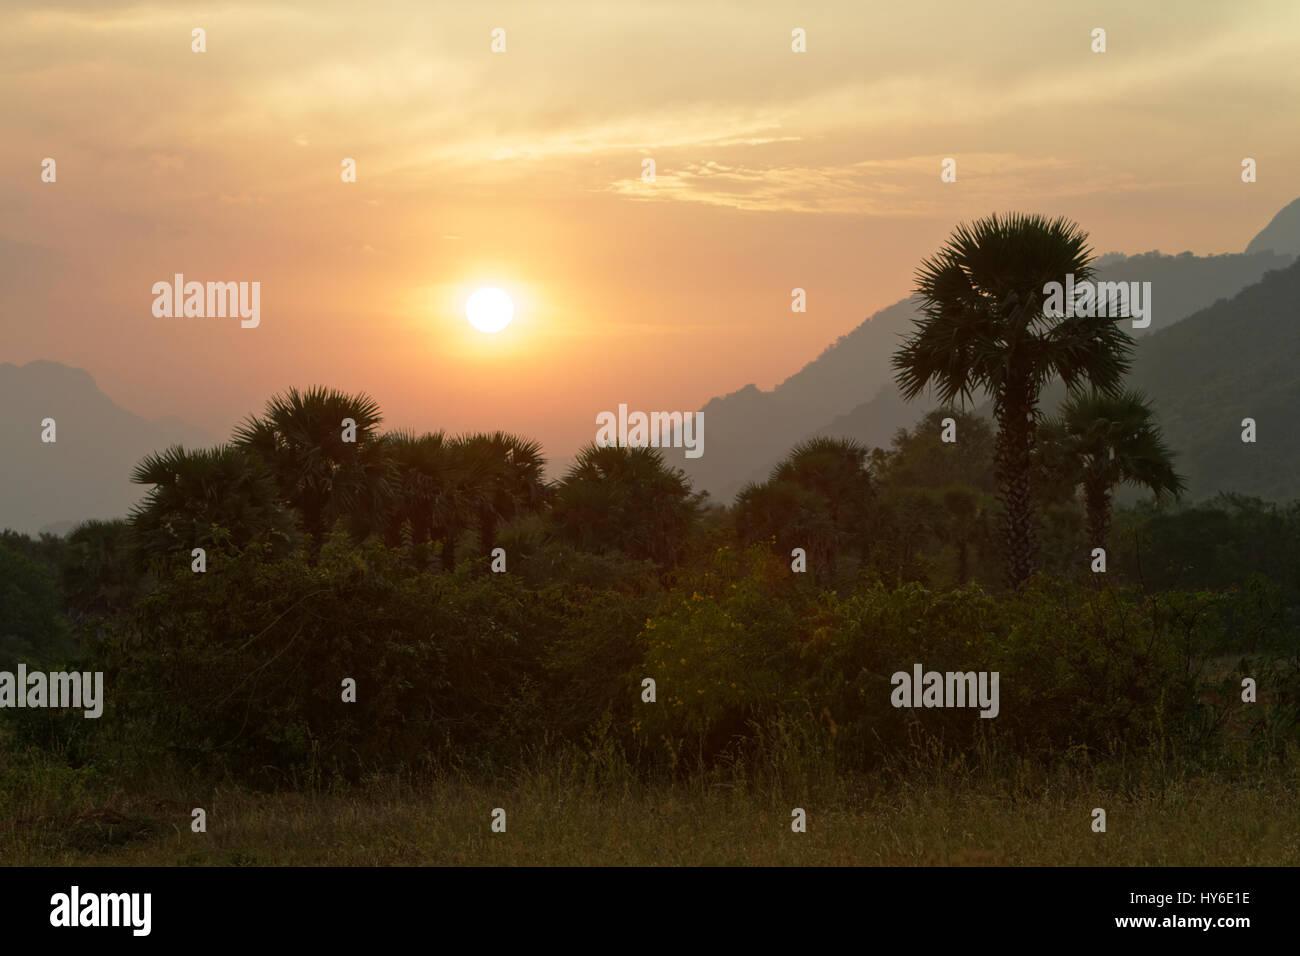 Tropical landscape in Ettimadai, near Coimbatore, Tamil Nadu, South India - Stock Image